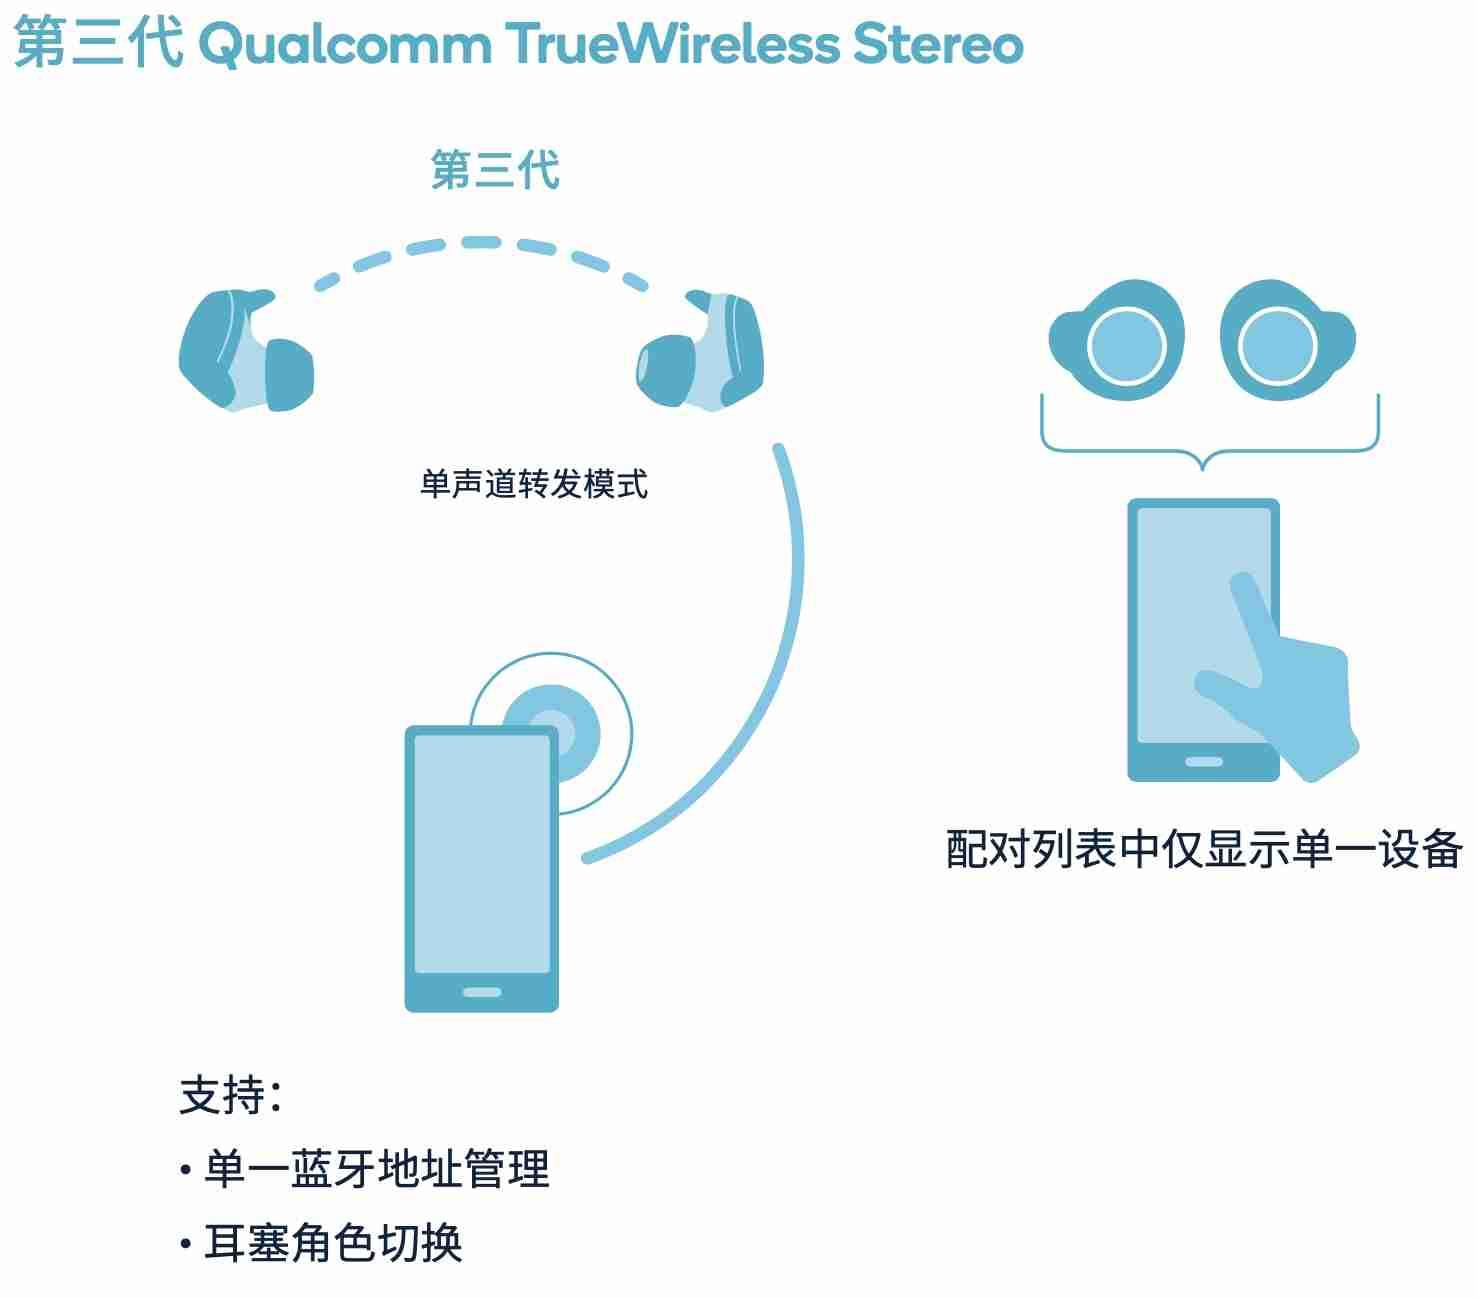 第三代Qualcomm TrueWireless Stereo